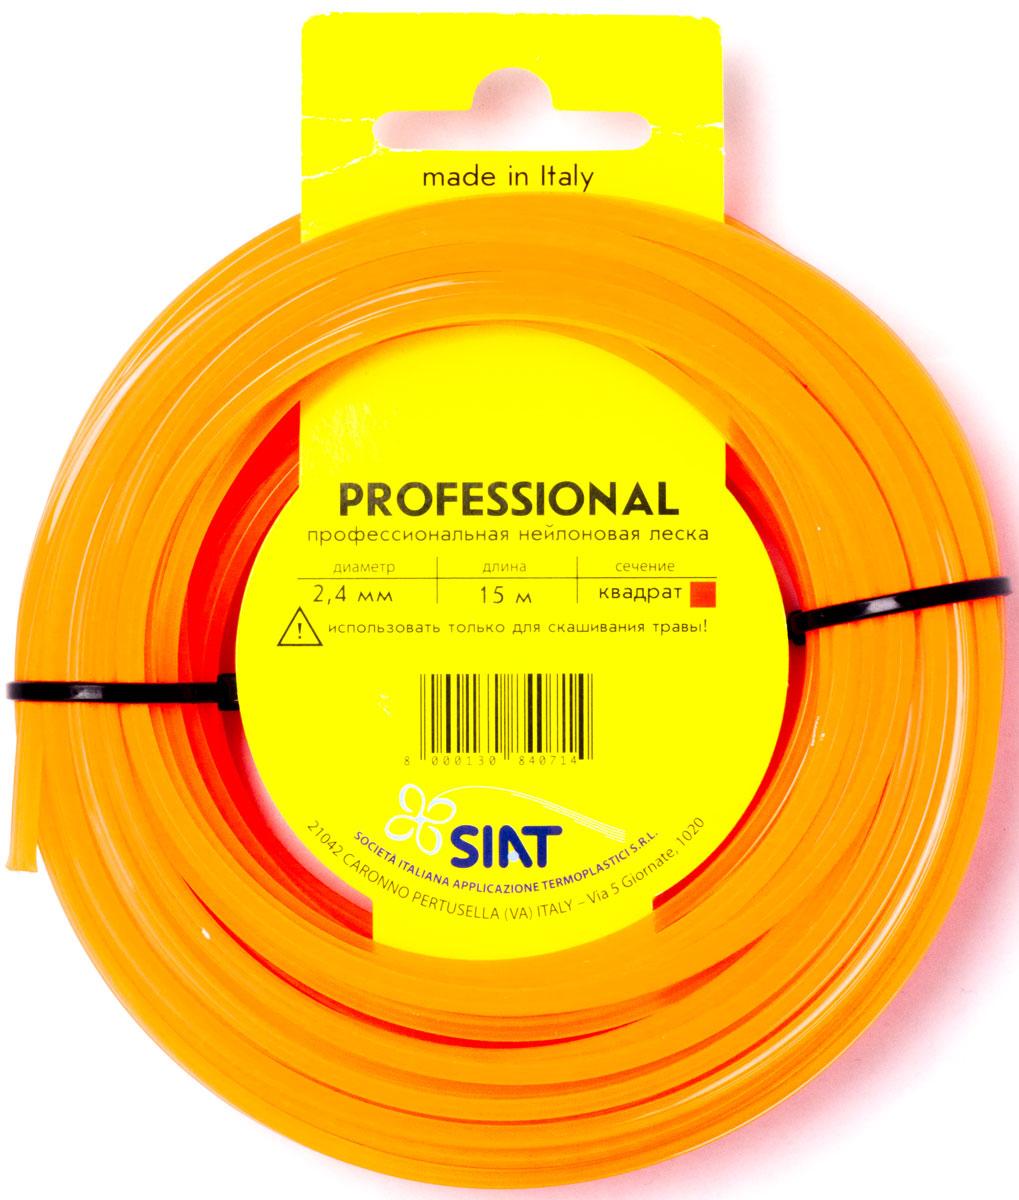 Леска для триммера Siat Professional Siat. Квадрат, диаметр 2,4 мм, длина 15 м леска для триммера siat professional siat звезда диаметр 3 мм длина 10 м